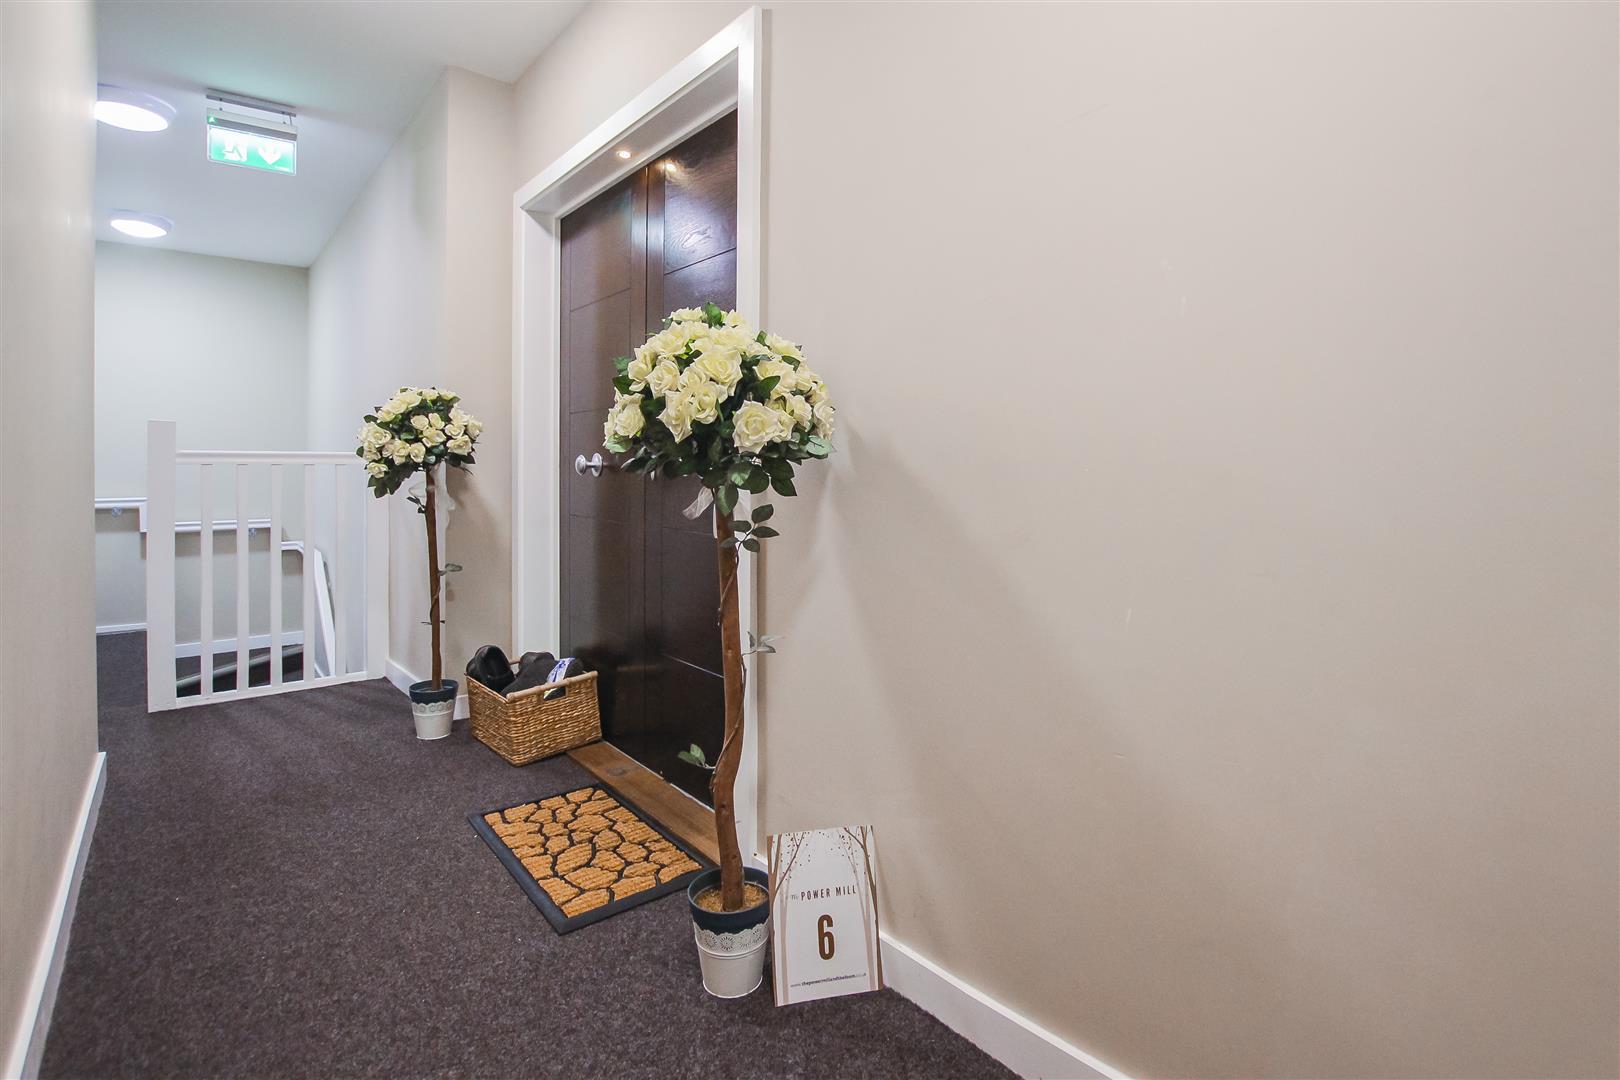 3 Bedroom Duplex Apartment For Sale - Image 20